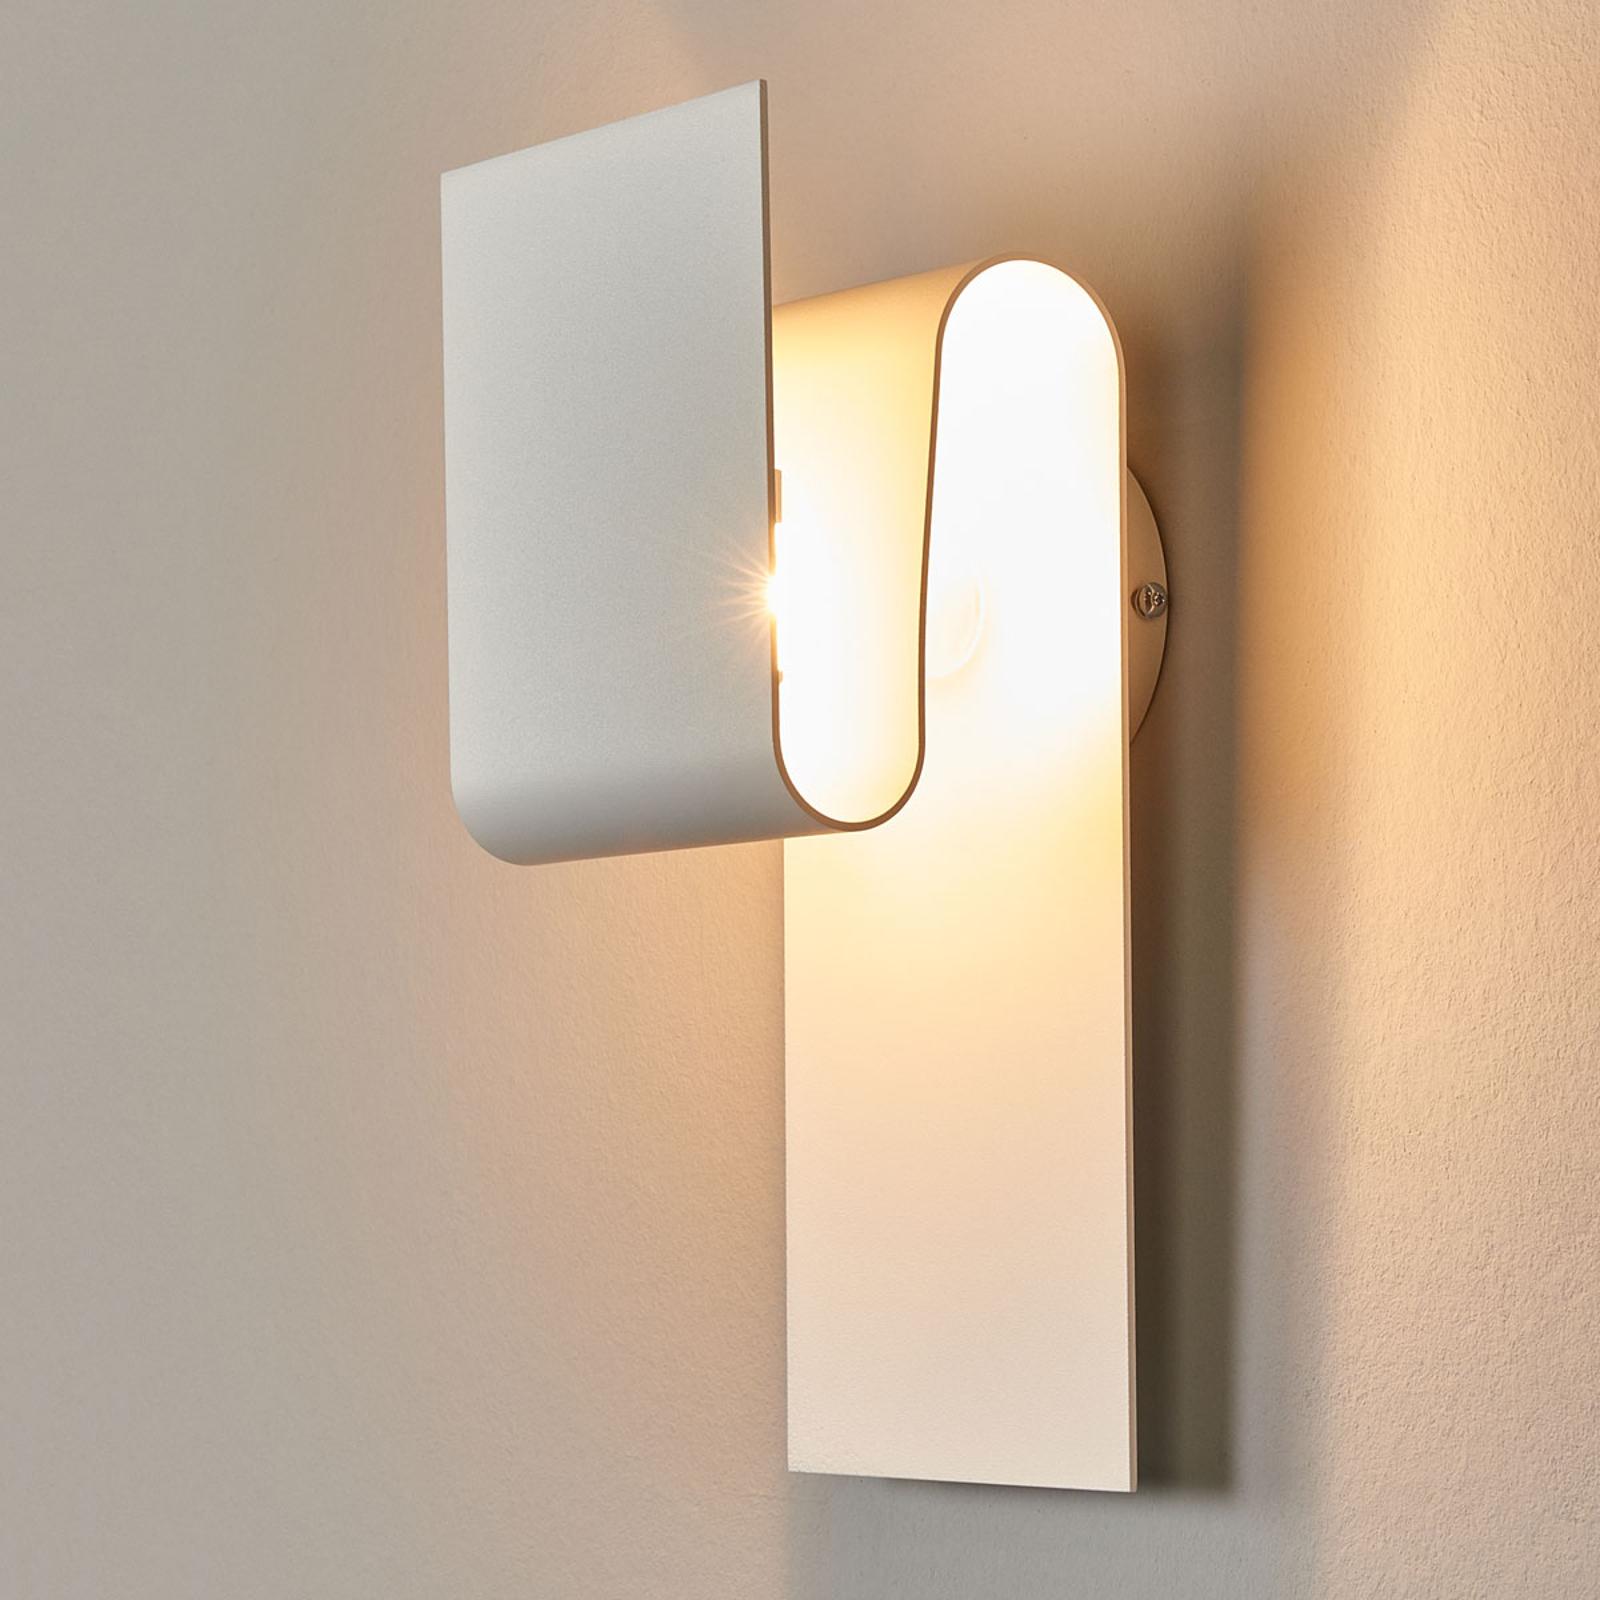 Inspiring LED wall lamp Fold_3051125_1